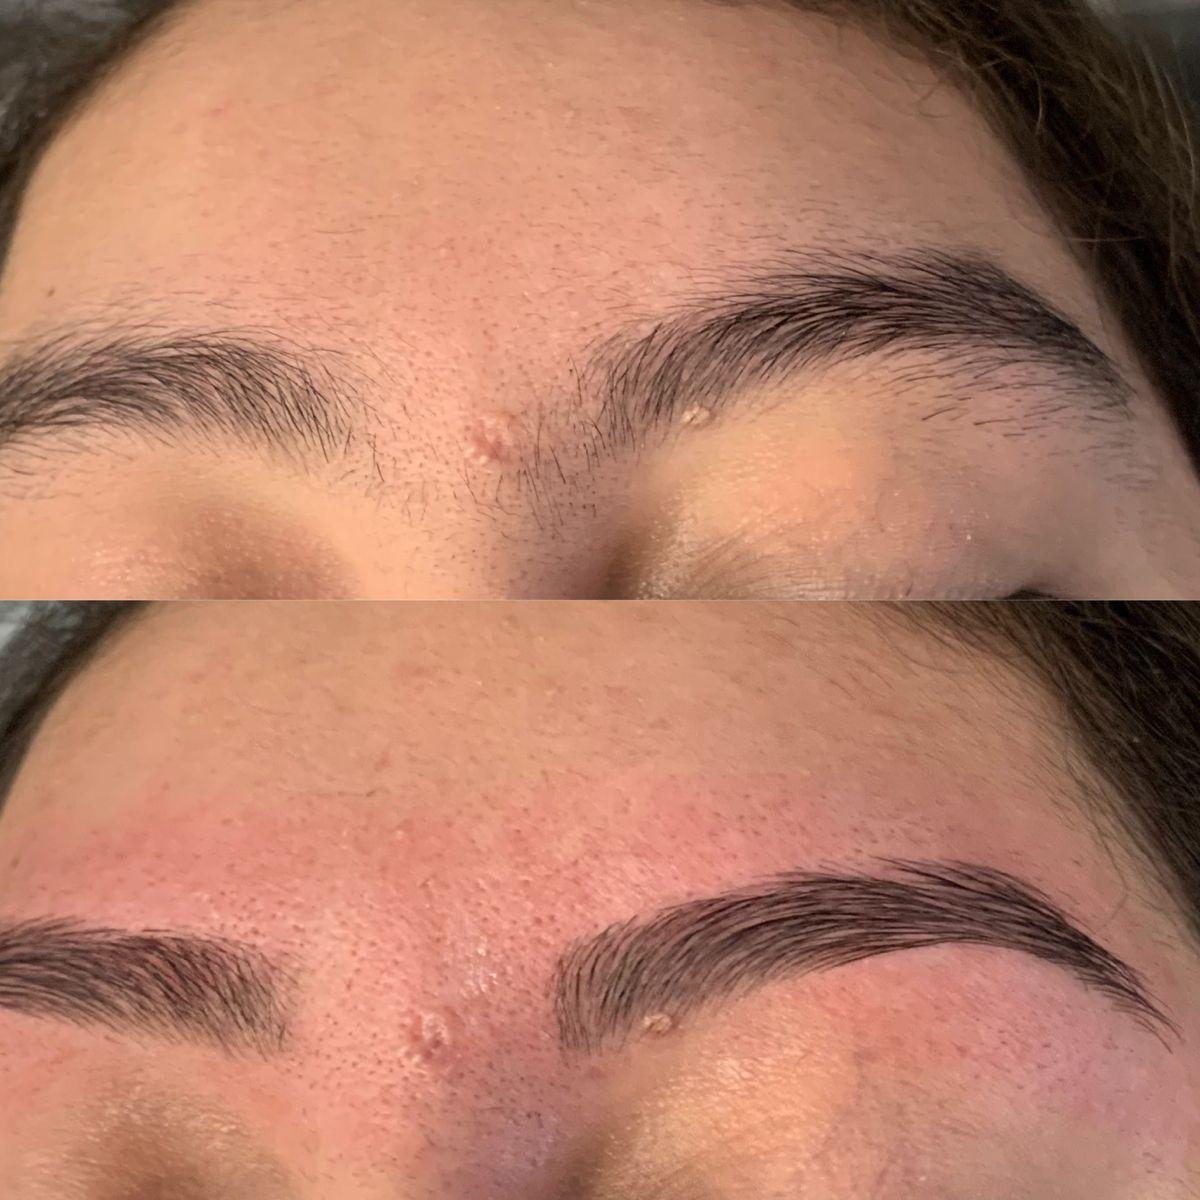 Eyebrow wax before and after in 2020 waxed eyebrows